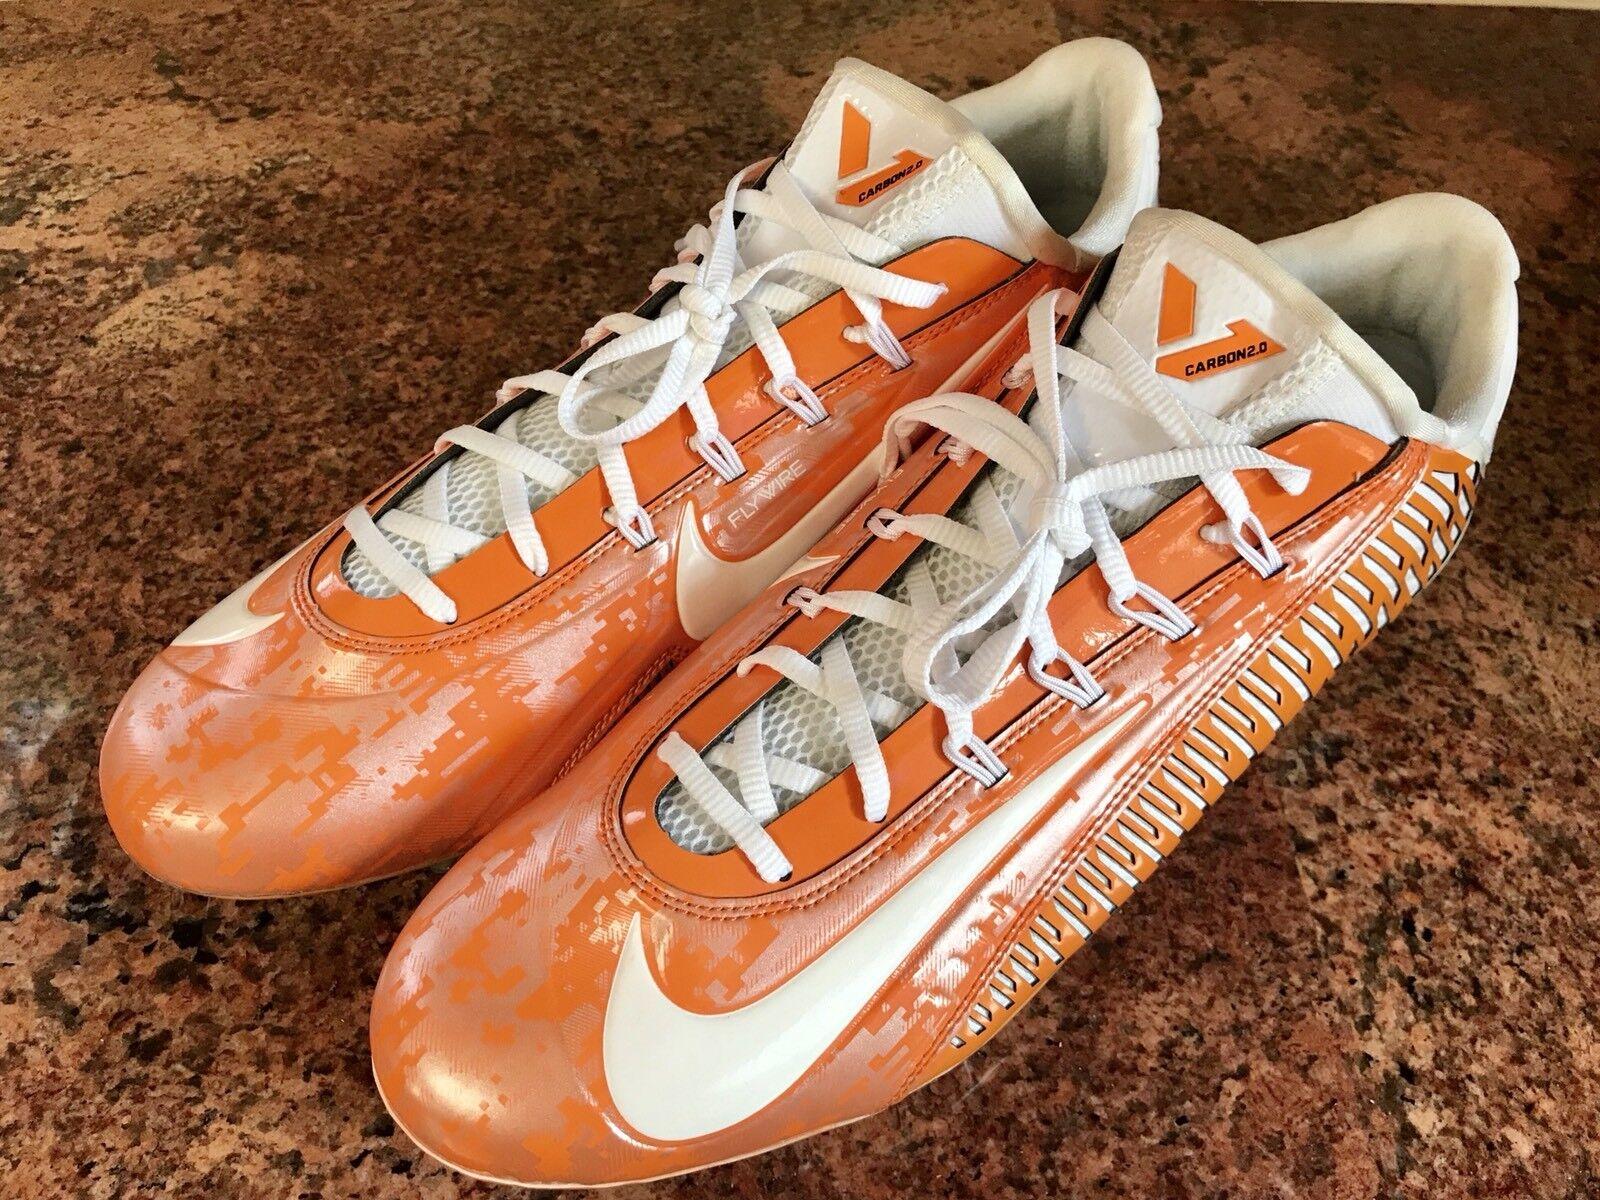 Nike 2.0 di vapore di carbonio 2.0 Nike elite nikeid football scarpette arancione / bianco Uomo sz 14,5 a0858d